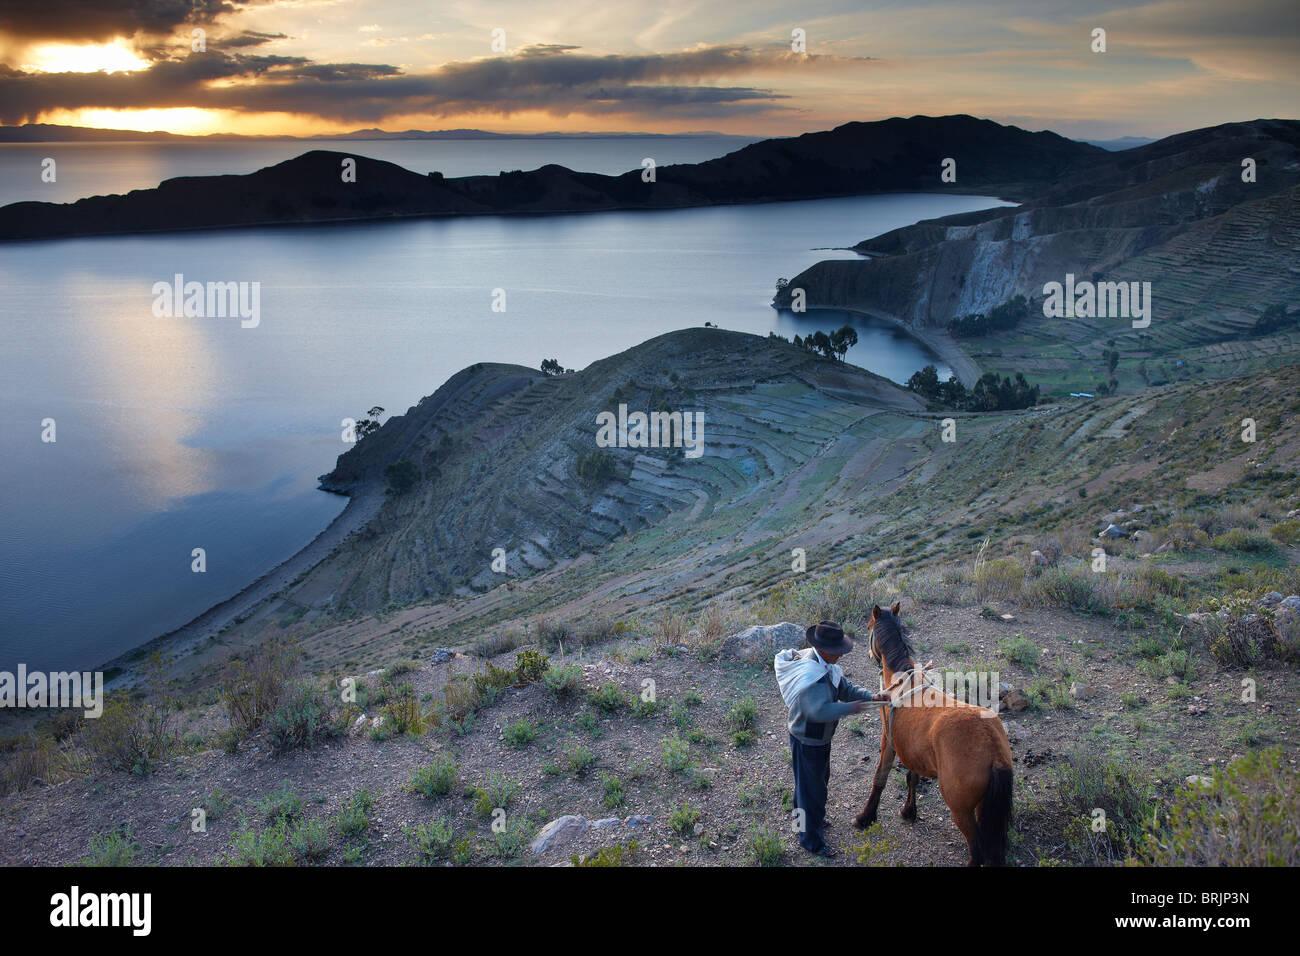 a campesino with his horse on Isla del Sol, Lake Titicaca, Bolivia Stock Photo